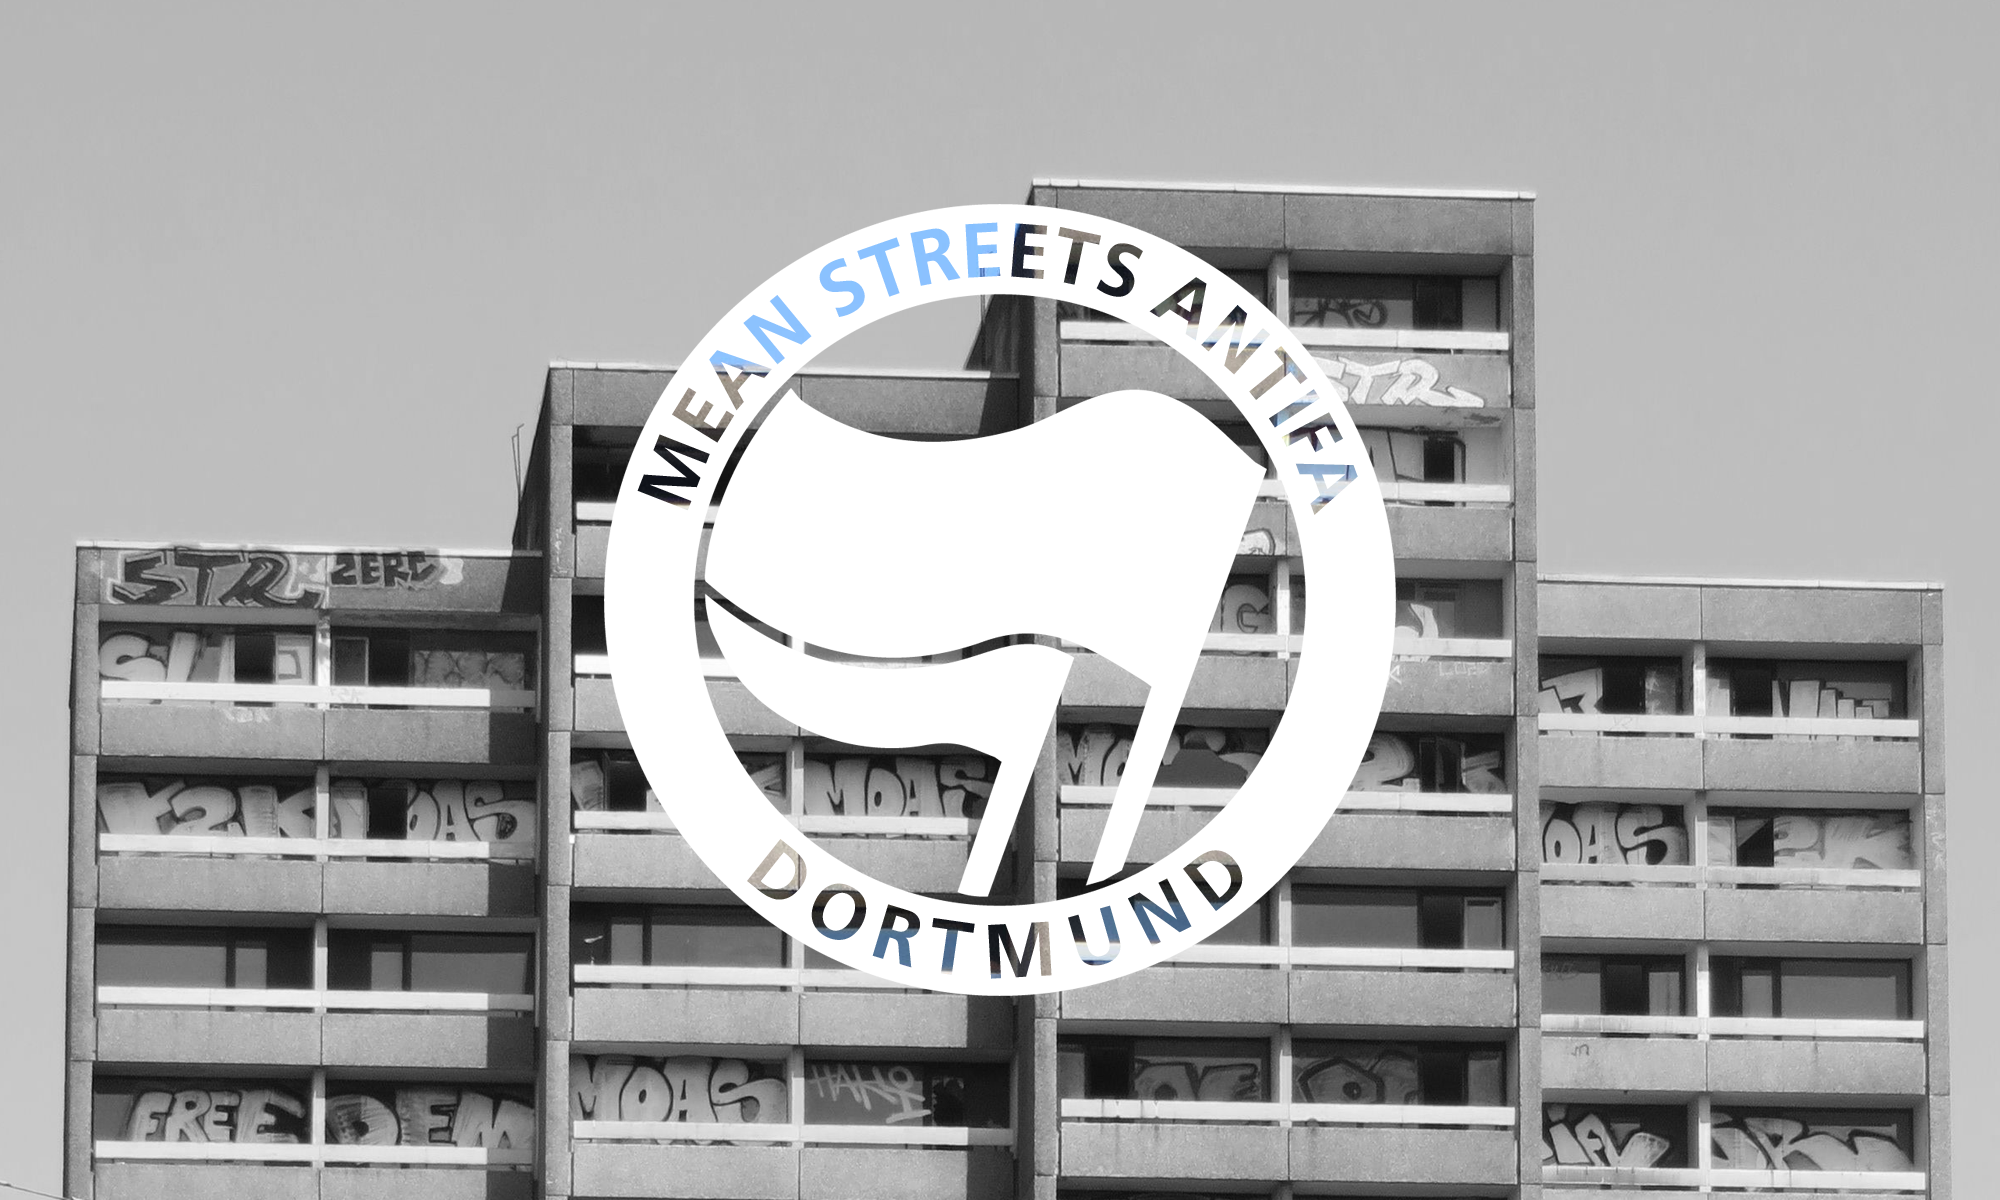 Mean Streets Antifa Dortmund